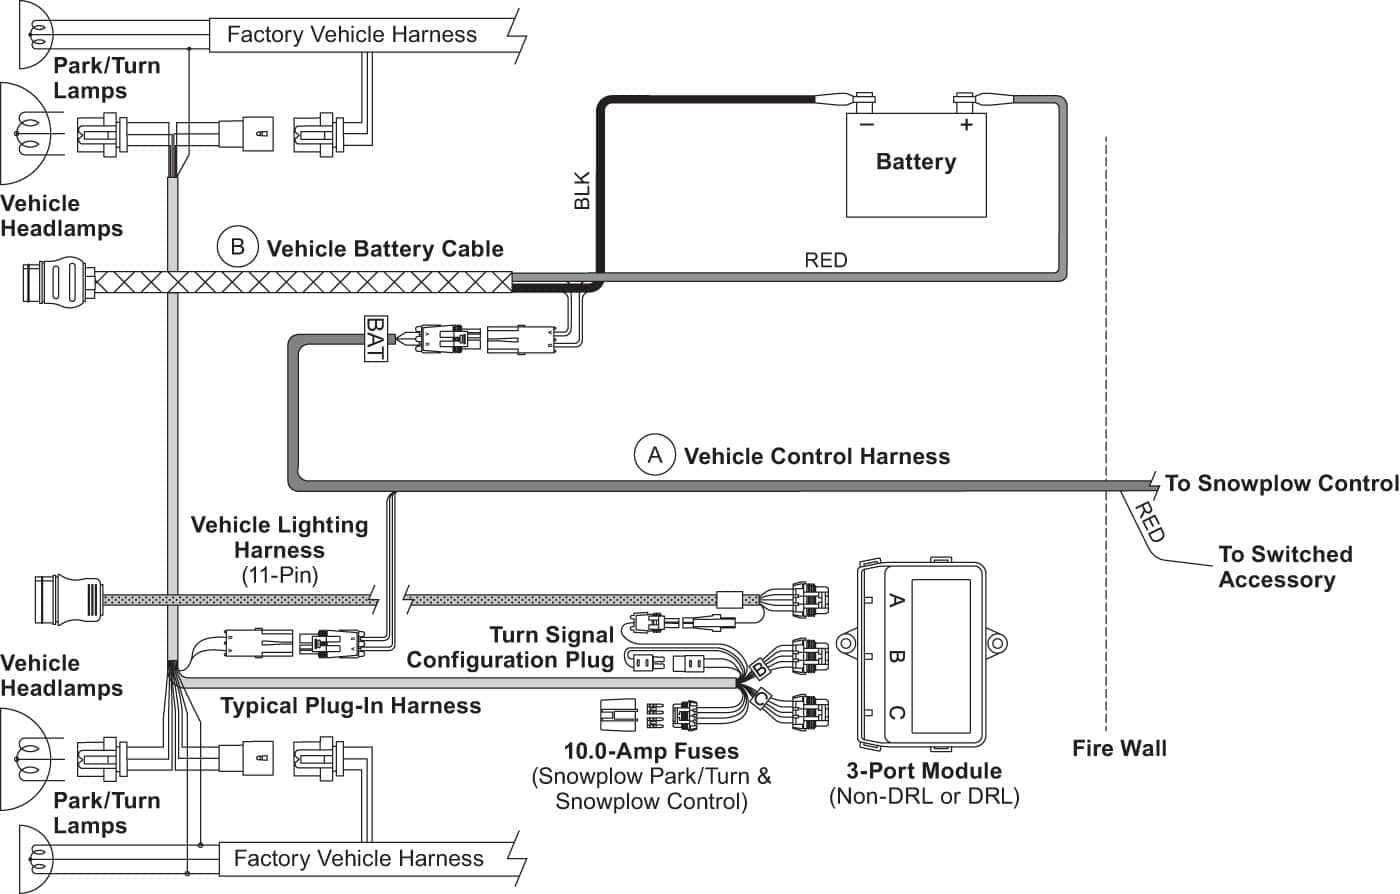 Snow Plow Wiring Diagram Power Unit - Wiring Diagram Data - Boss Snow Plow Wiring Diagram